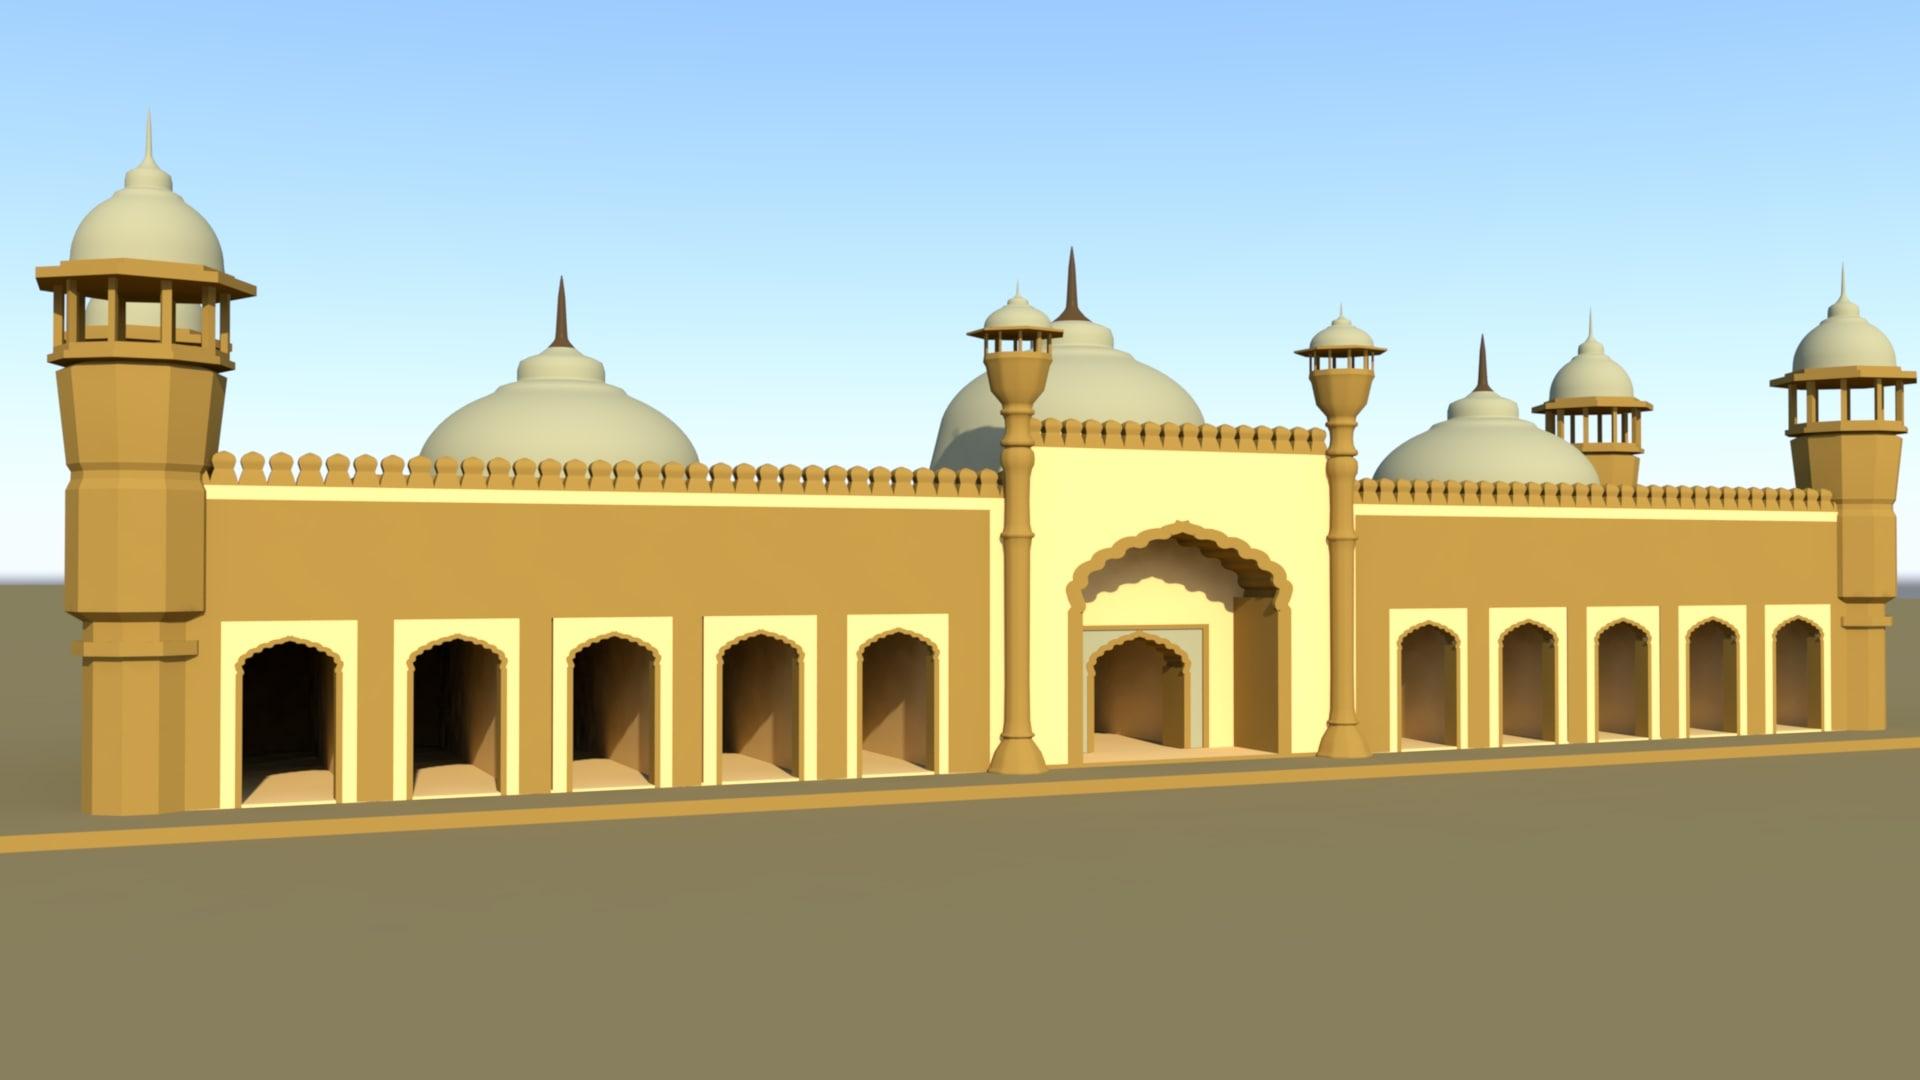 masjid modeled 3D model